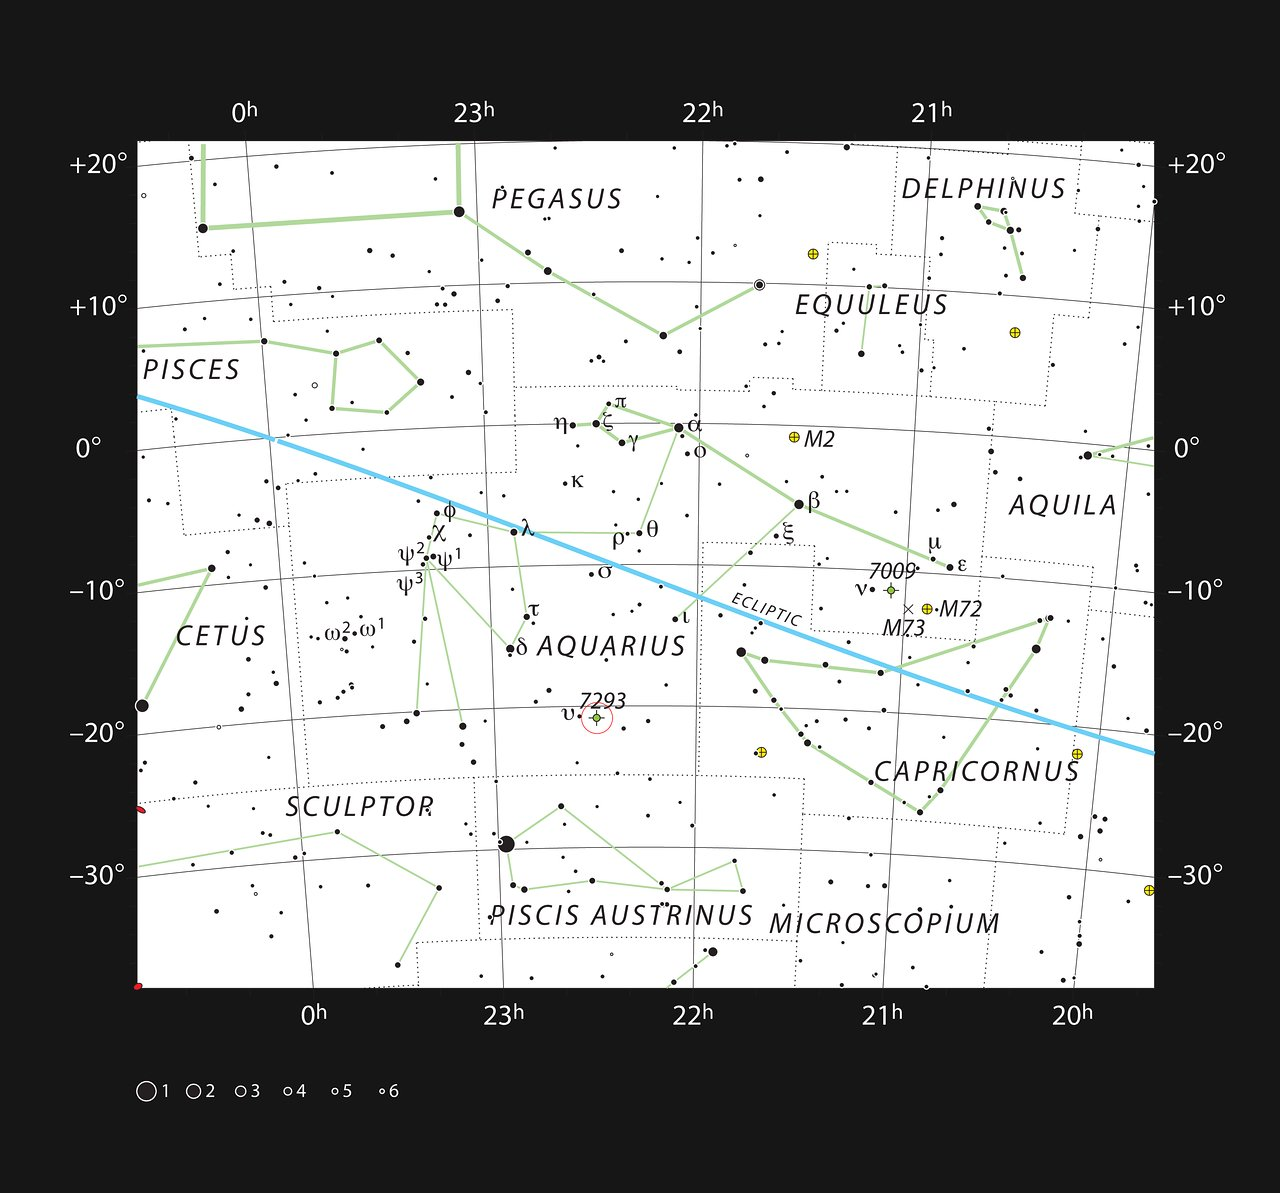 constellation map of helix nebula - photo #26